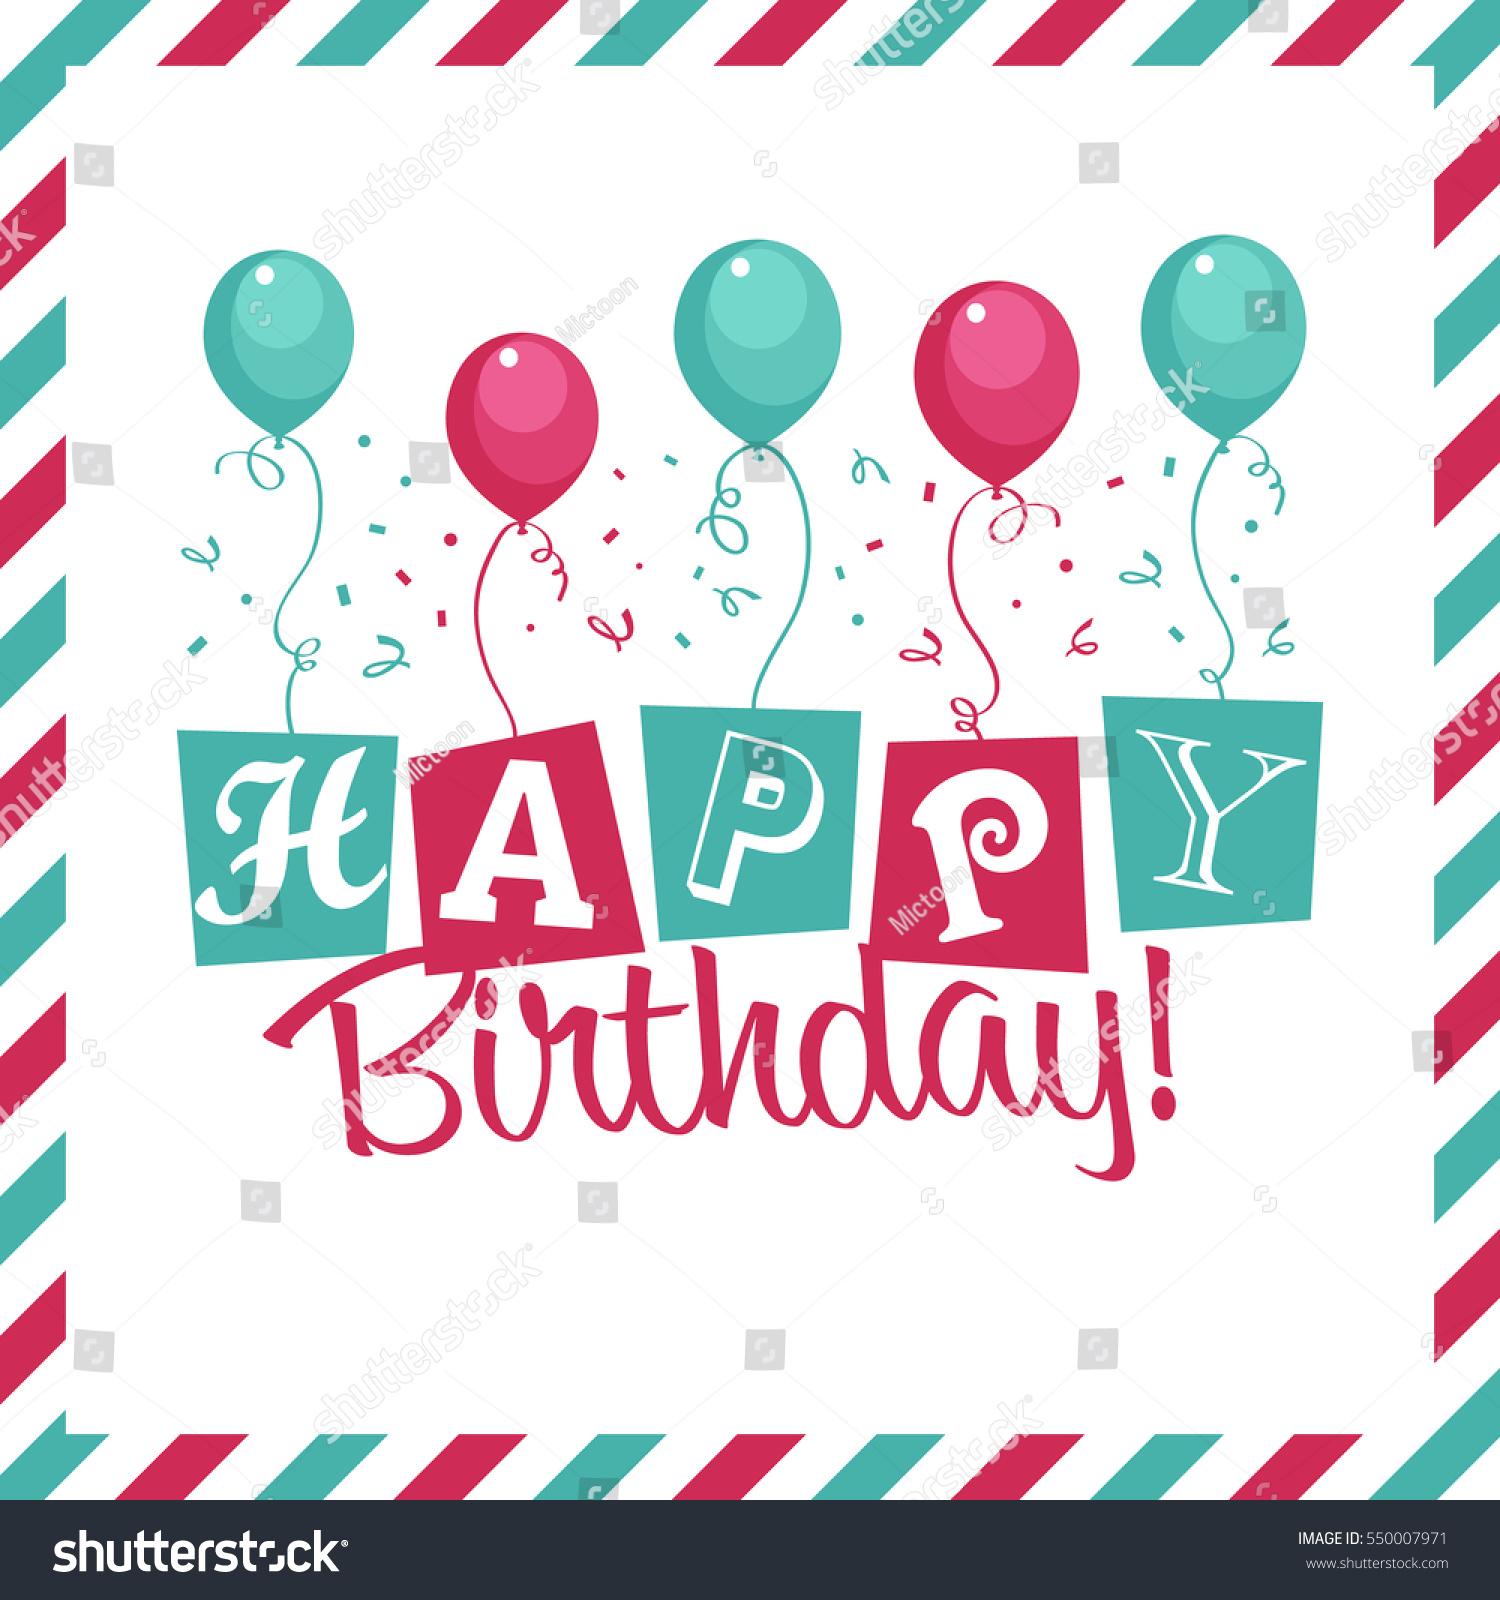 Happy Birthday Invitation Greeting Card Party Stock Vector HD ...